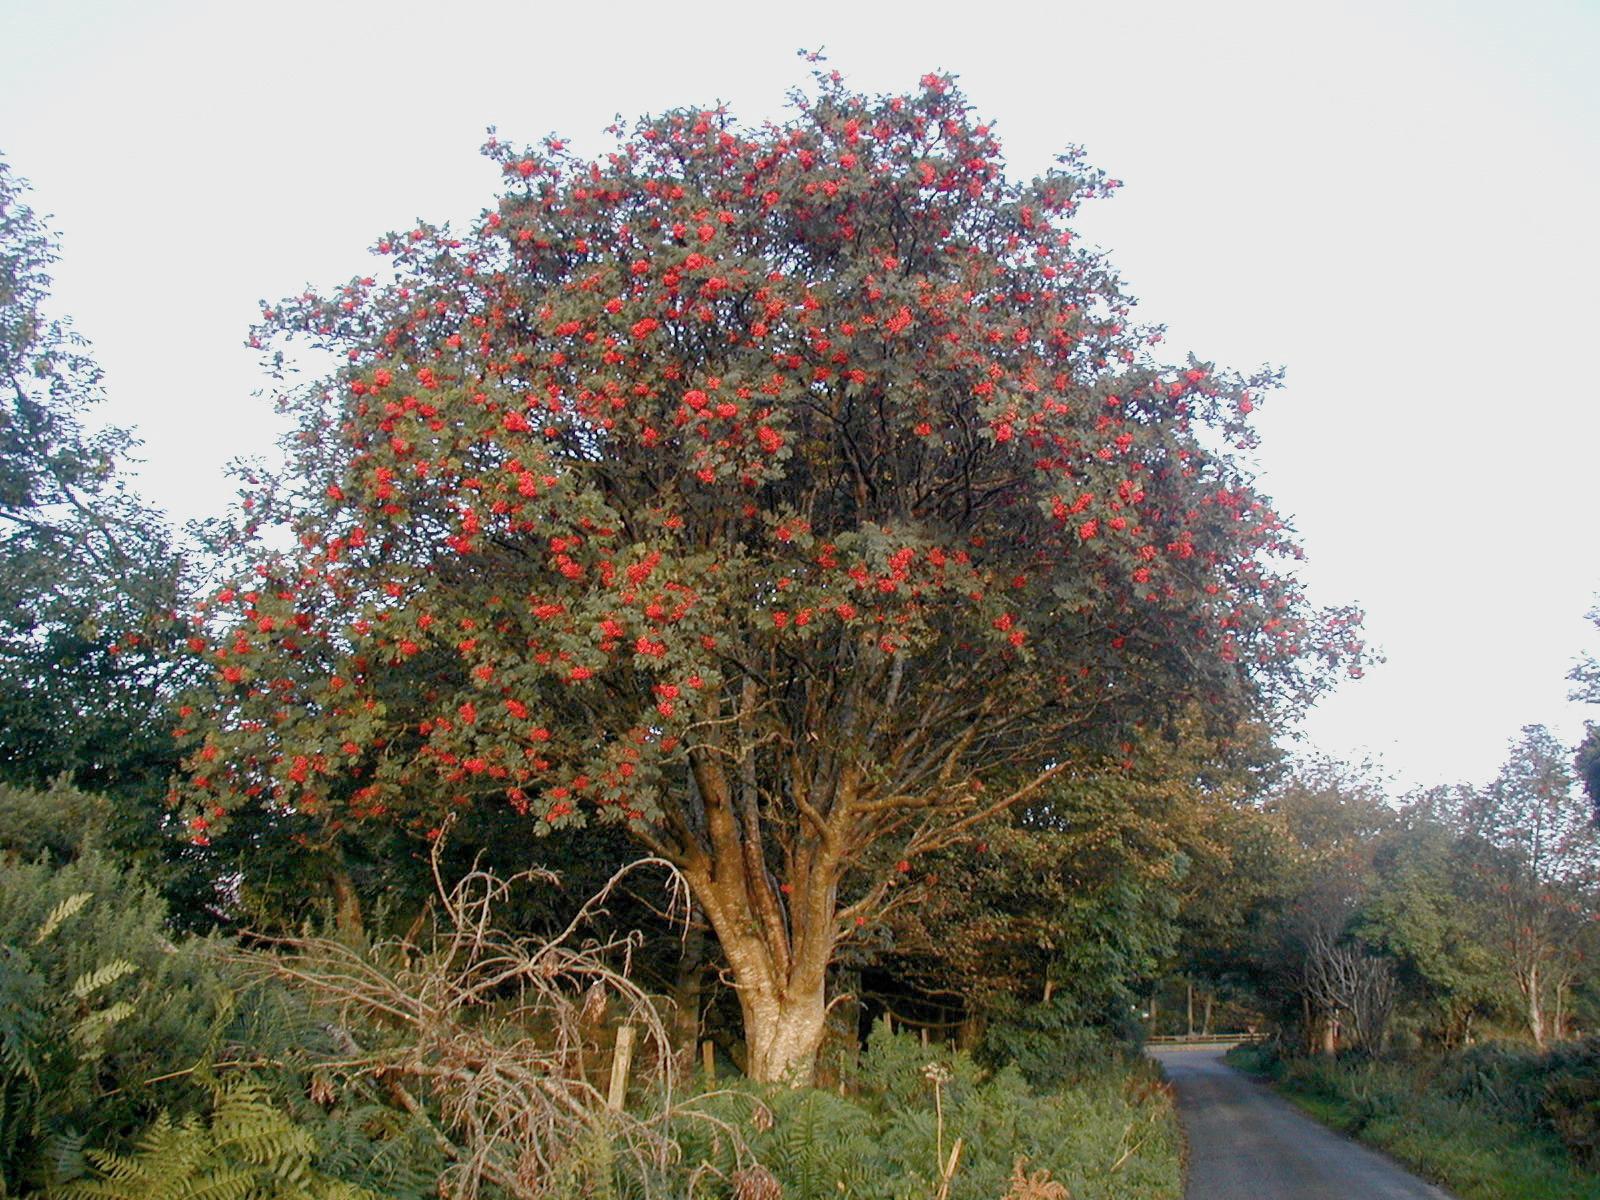 A Rowan Tree (Sorbus aucuparia) beside a road in Ireland